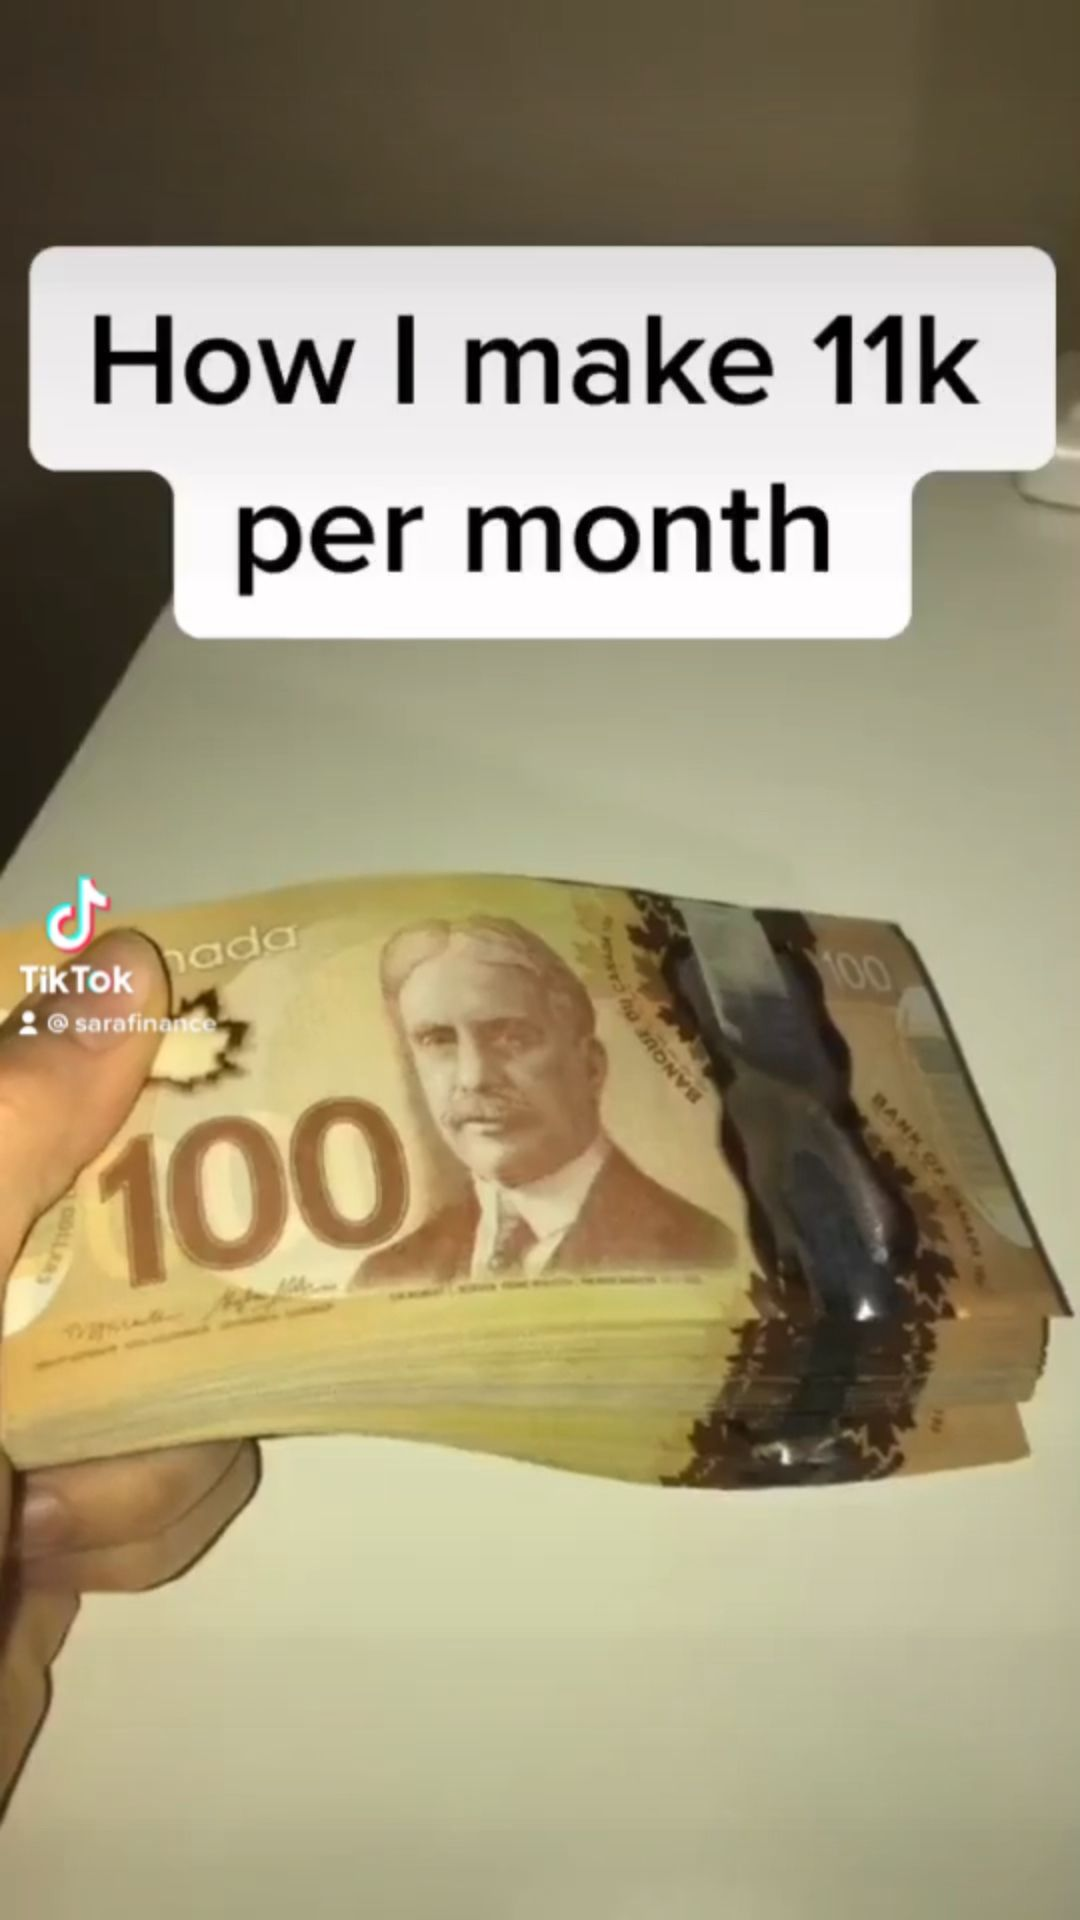 I make $11k per month💰